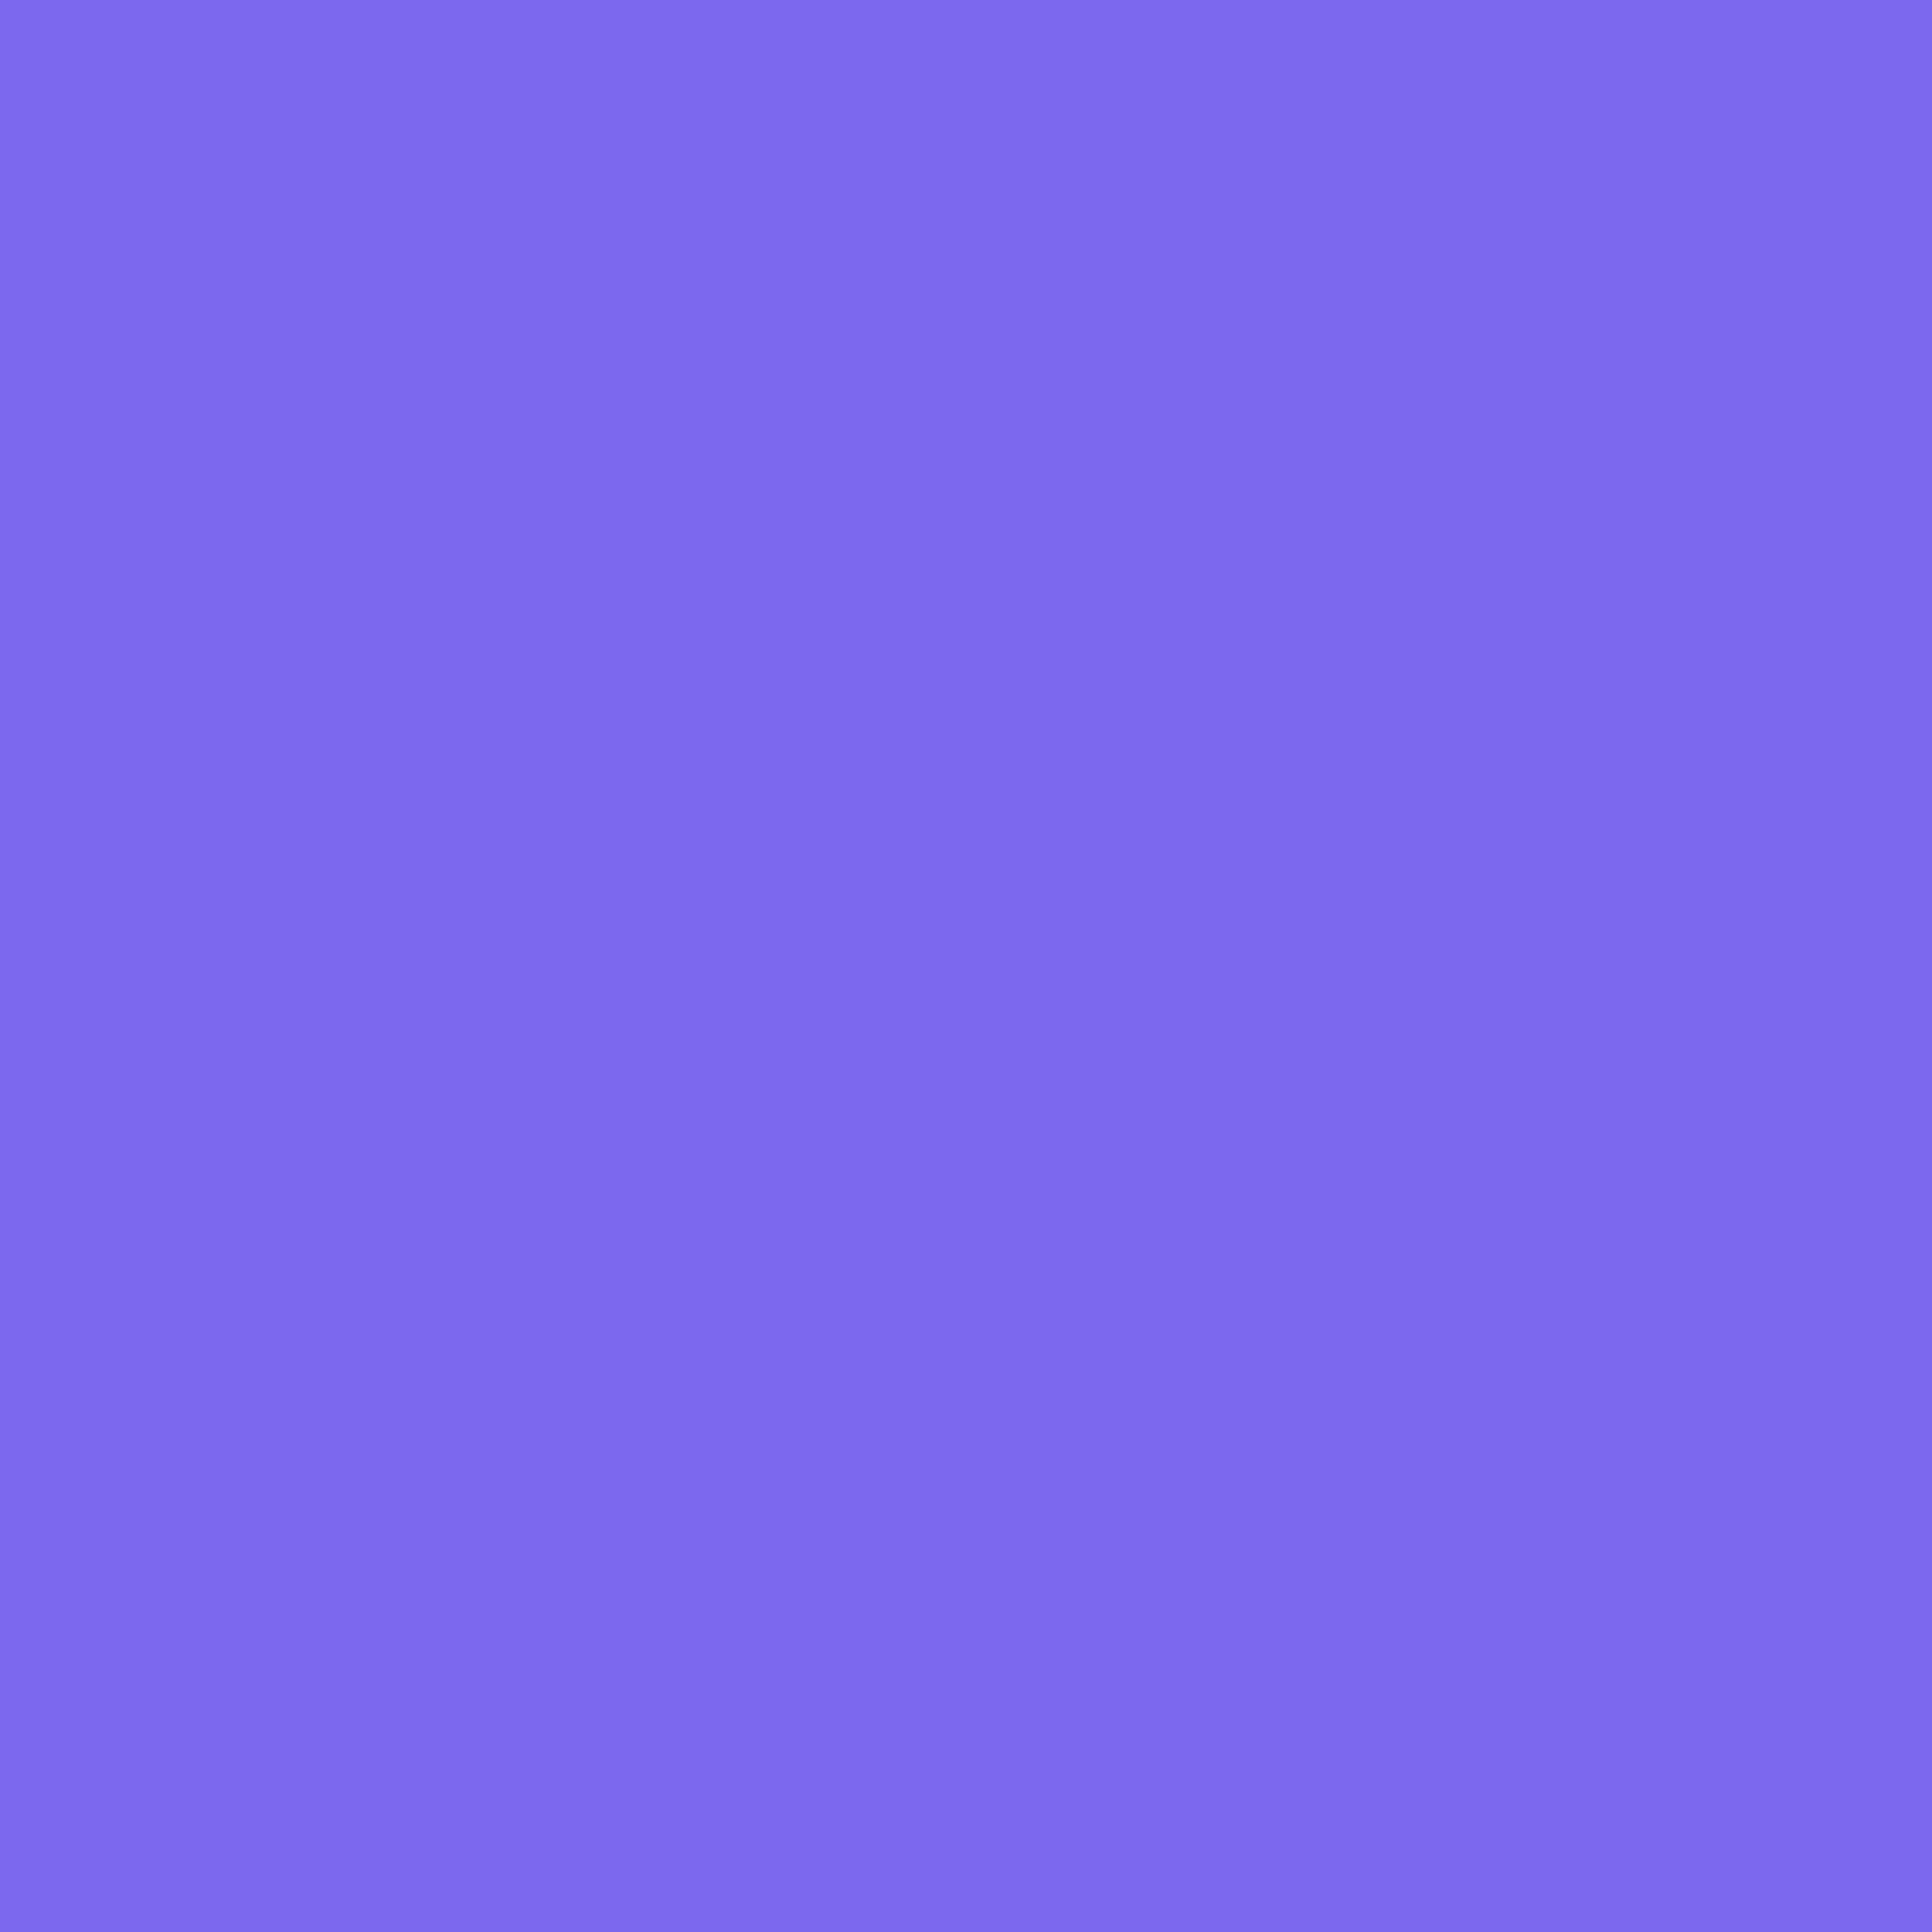 2732x2732 Medium Slate Blue Solid Color Background